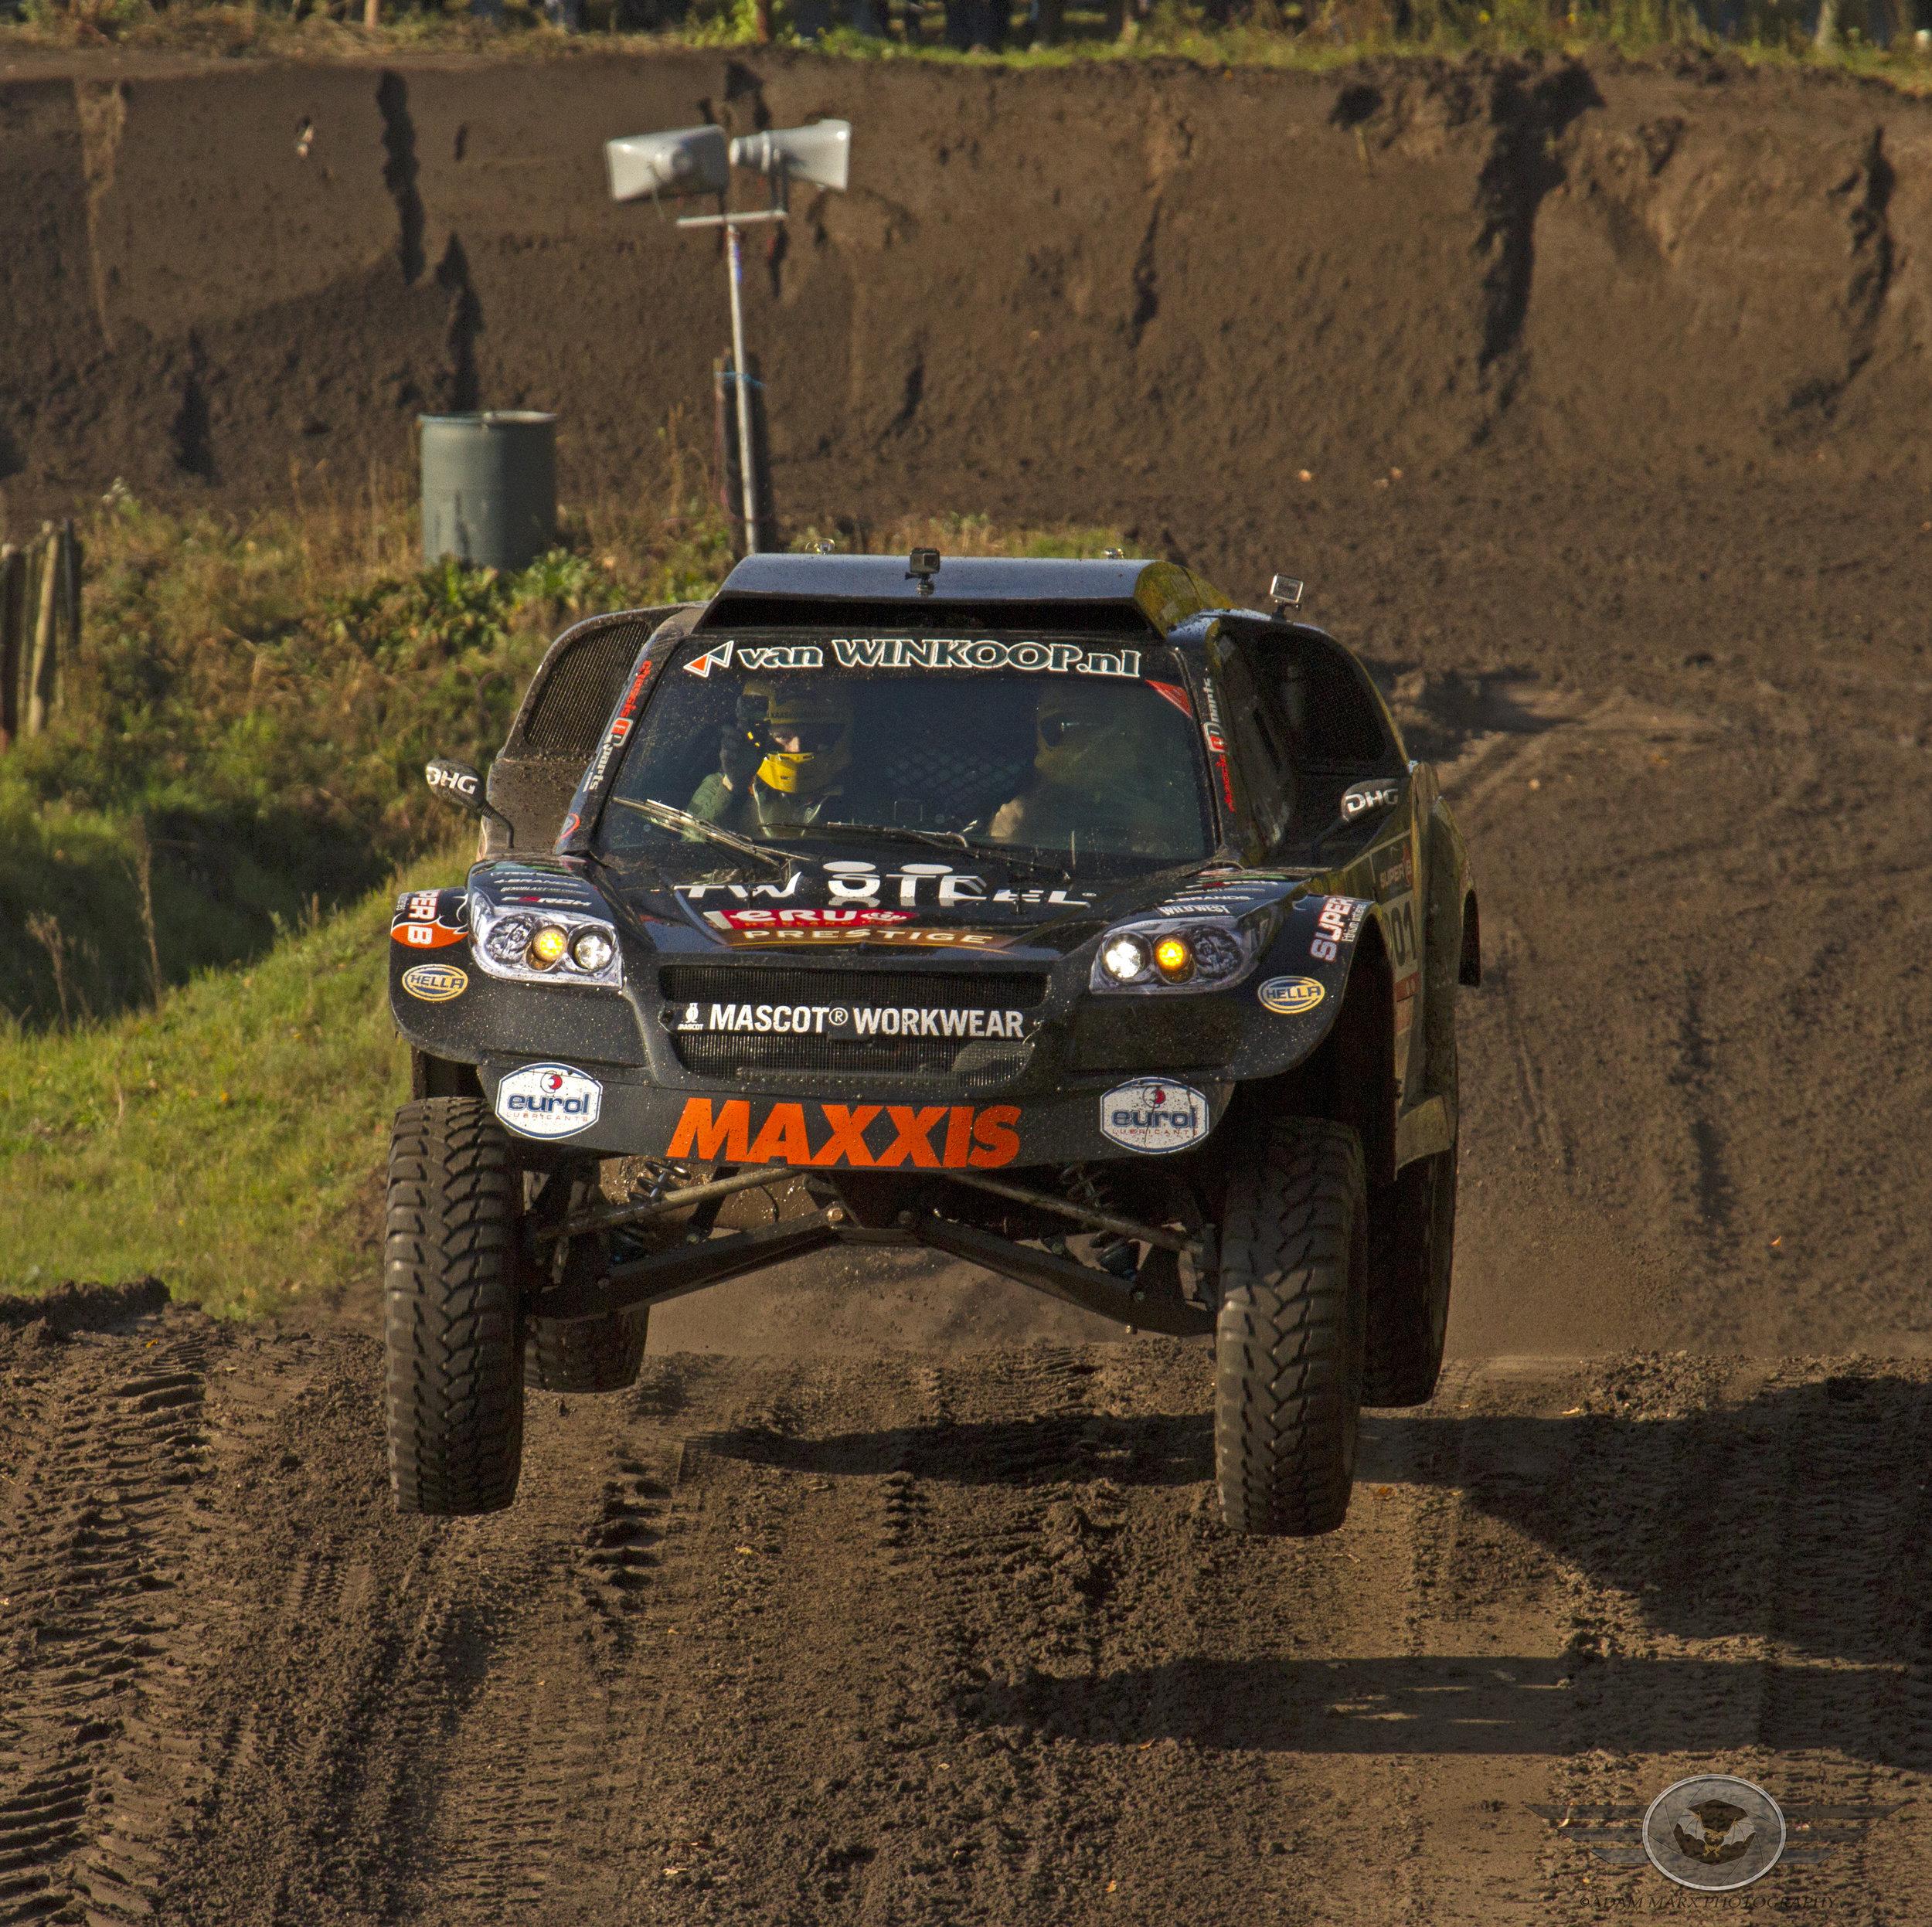 """the Beast""   Jefferies Dakar rally buggy from the Twins Tim & Tom Coronel."